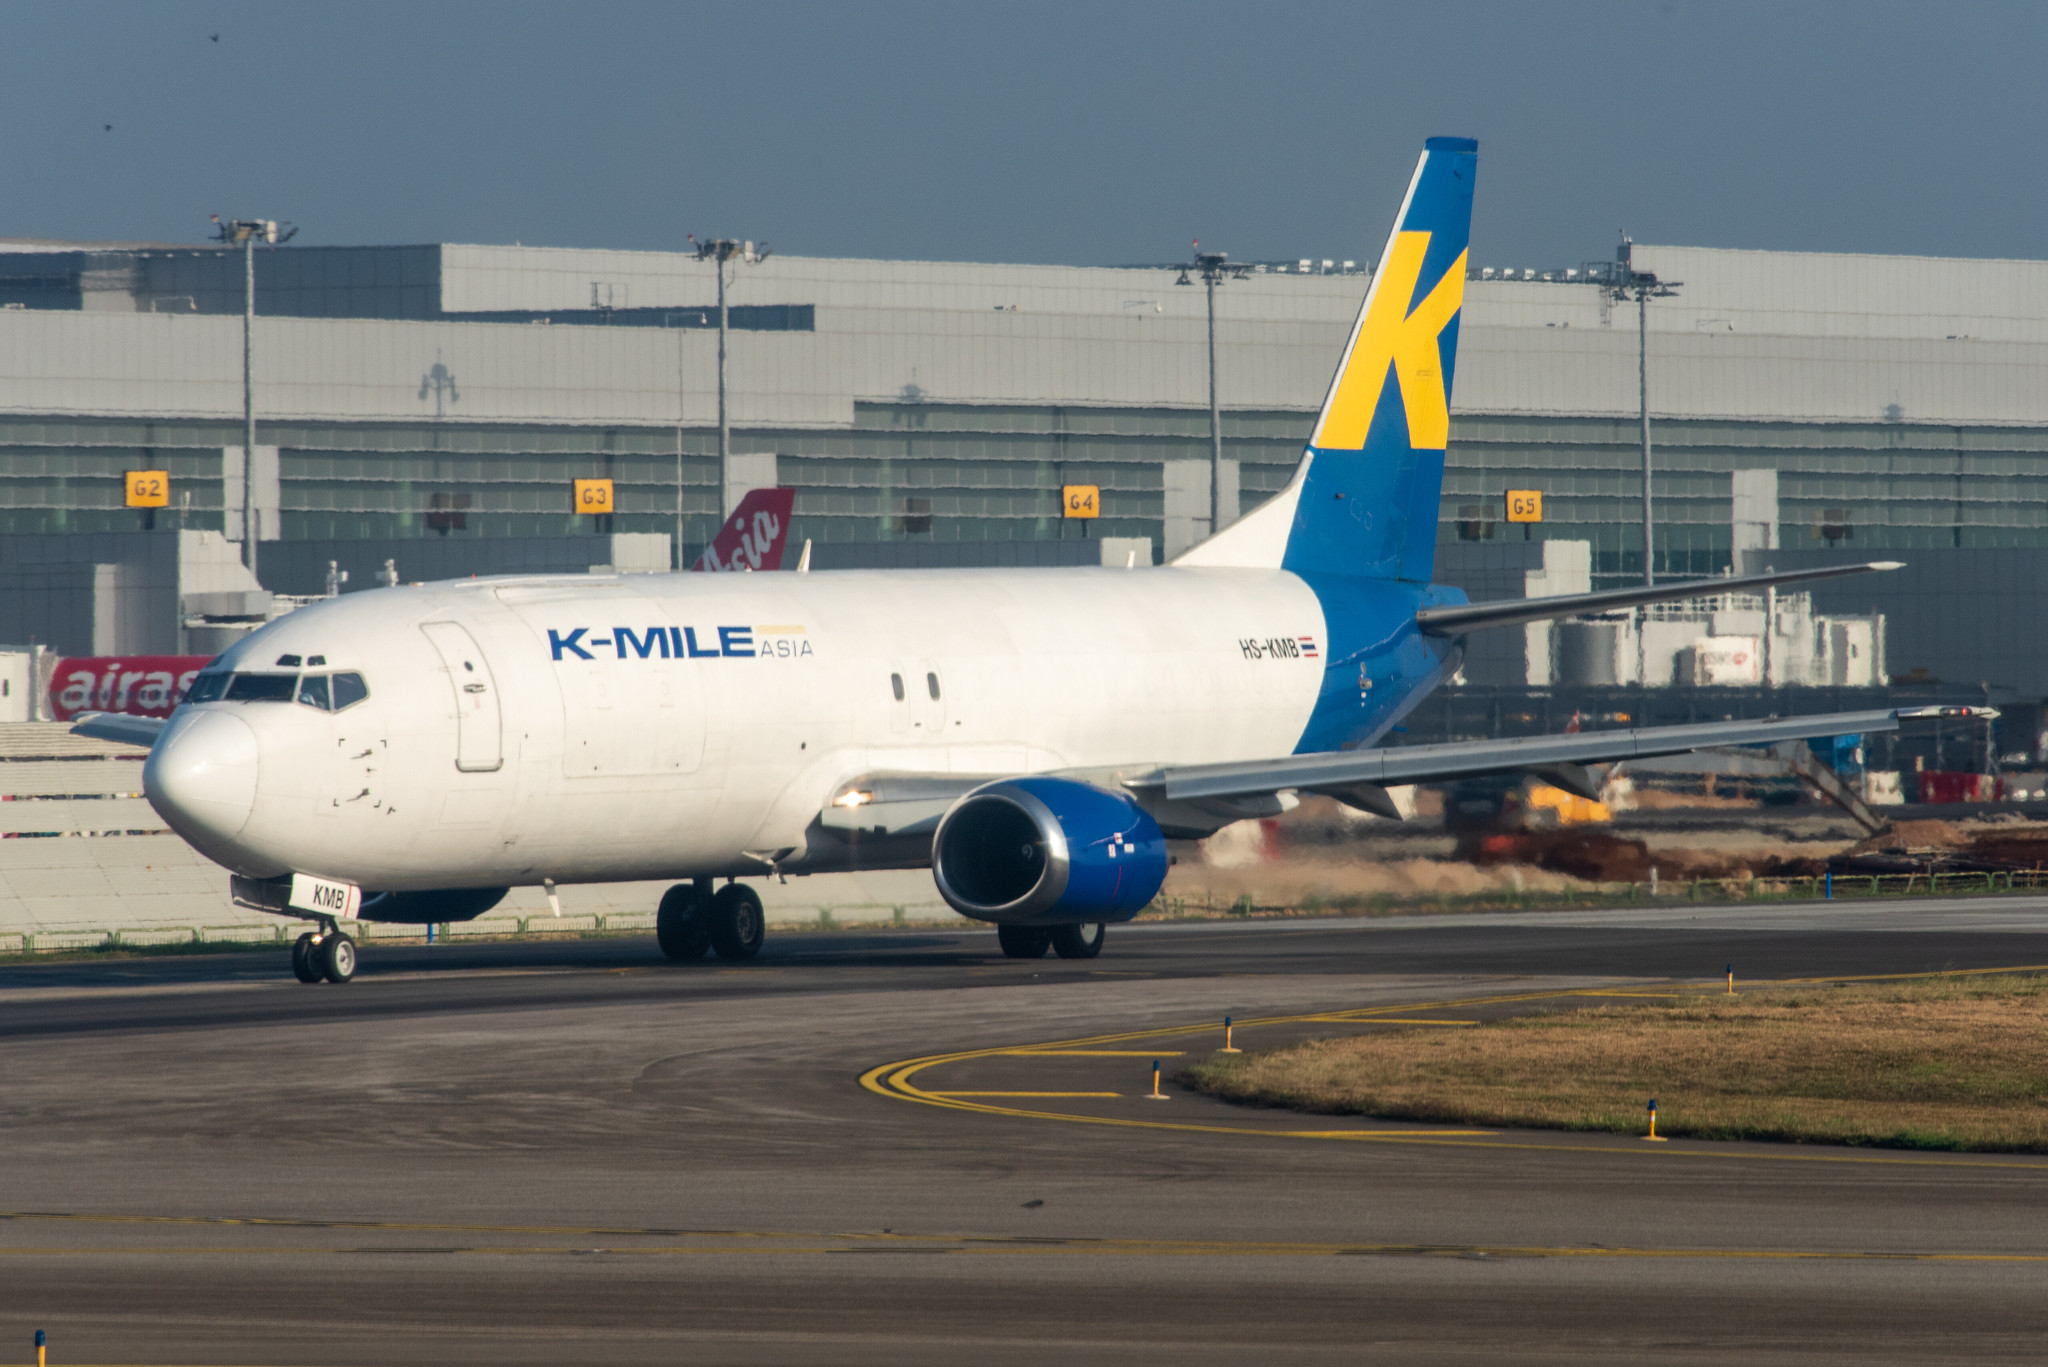 K-Mile Asia Boeing 737-400F; HS-KMB@SIN;29.11.2019